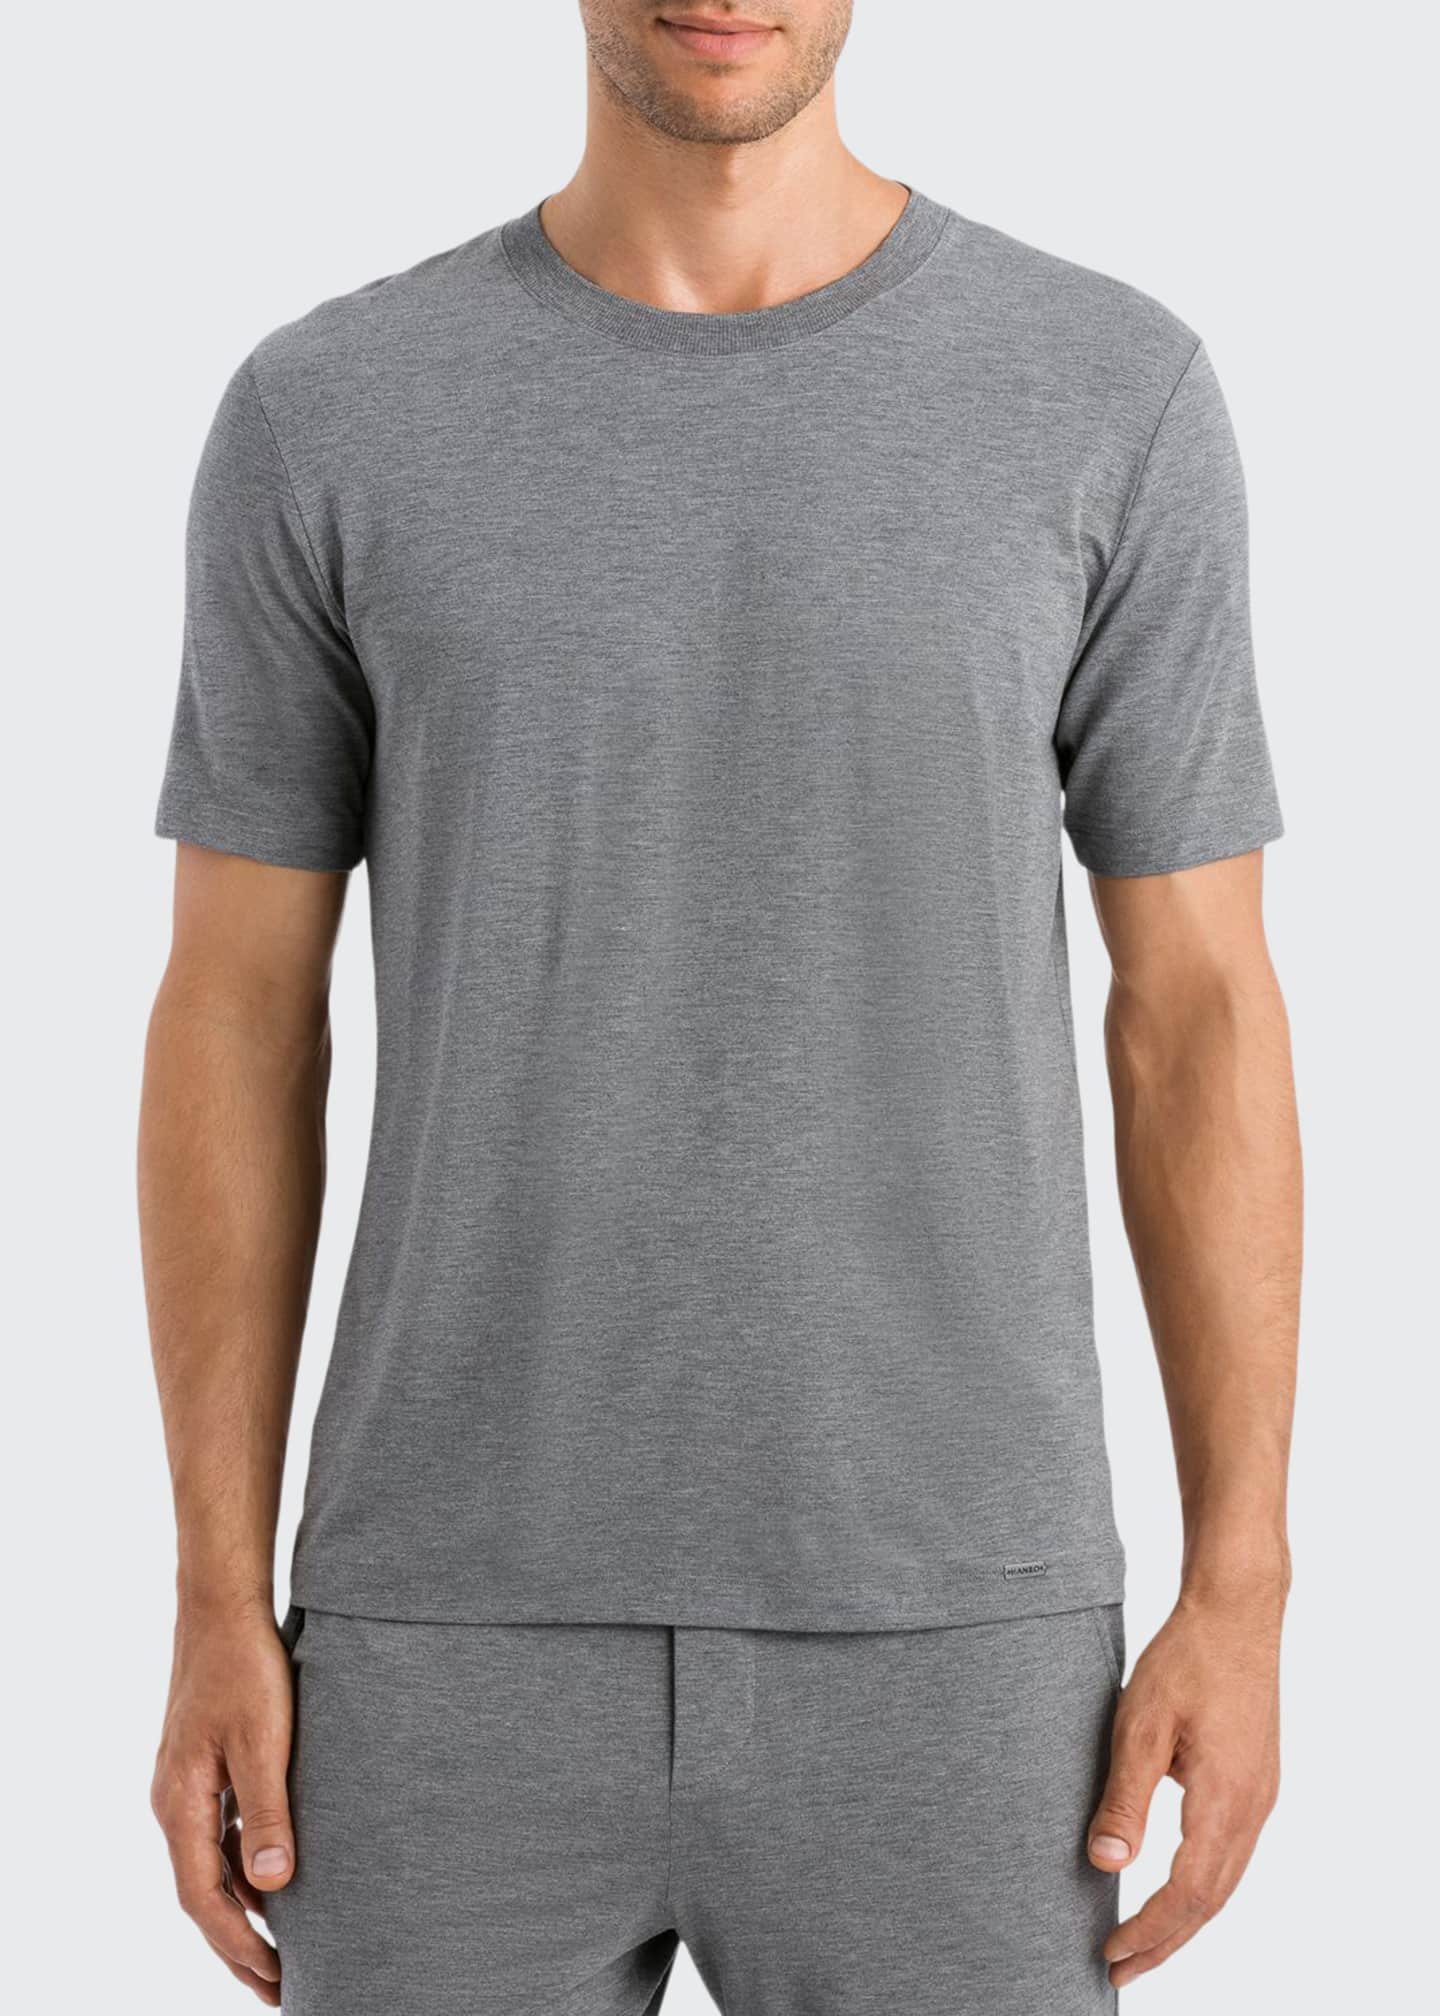 Hanro Men's Casual Short-Sleeve T-Shirt